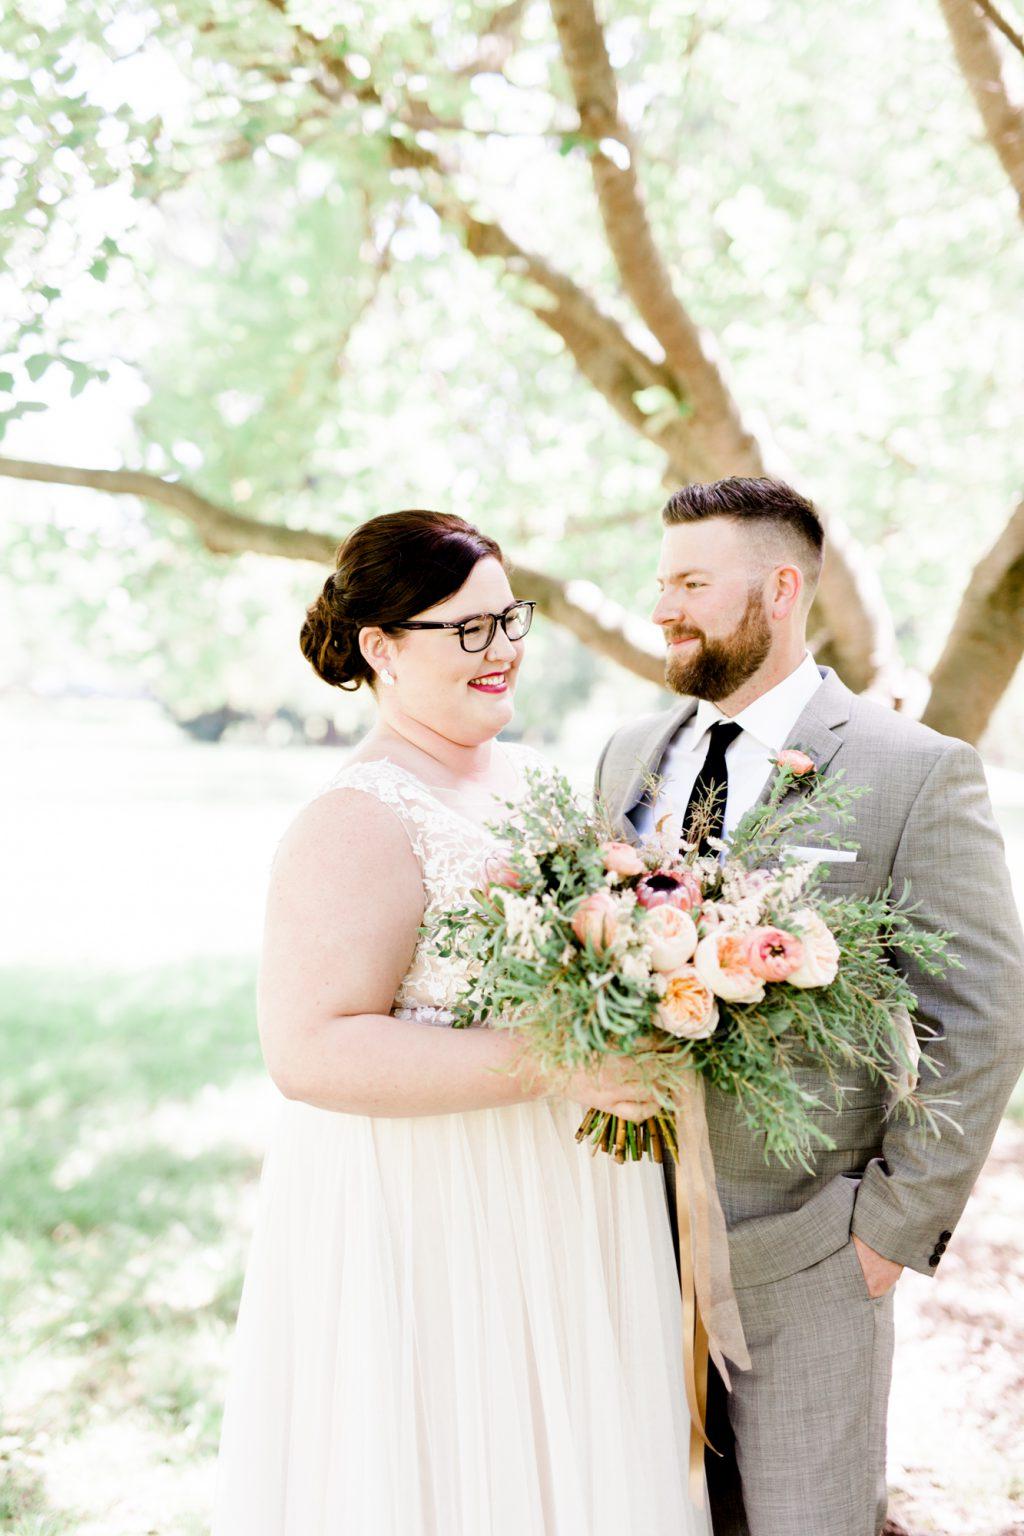 haley-richter-photo-west-chester-summer-wedding-boxcar-brewery-034